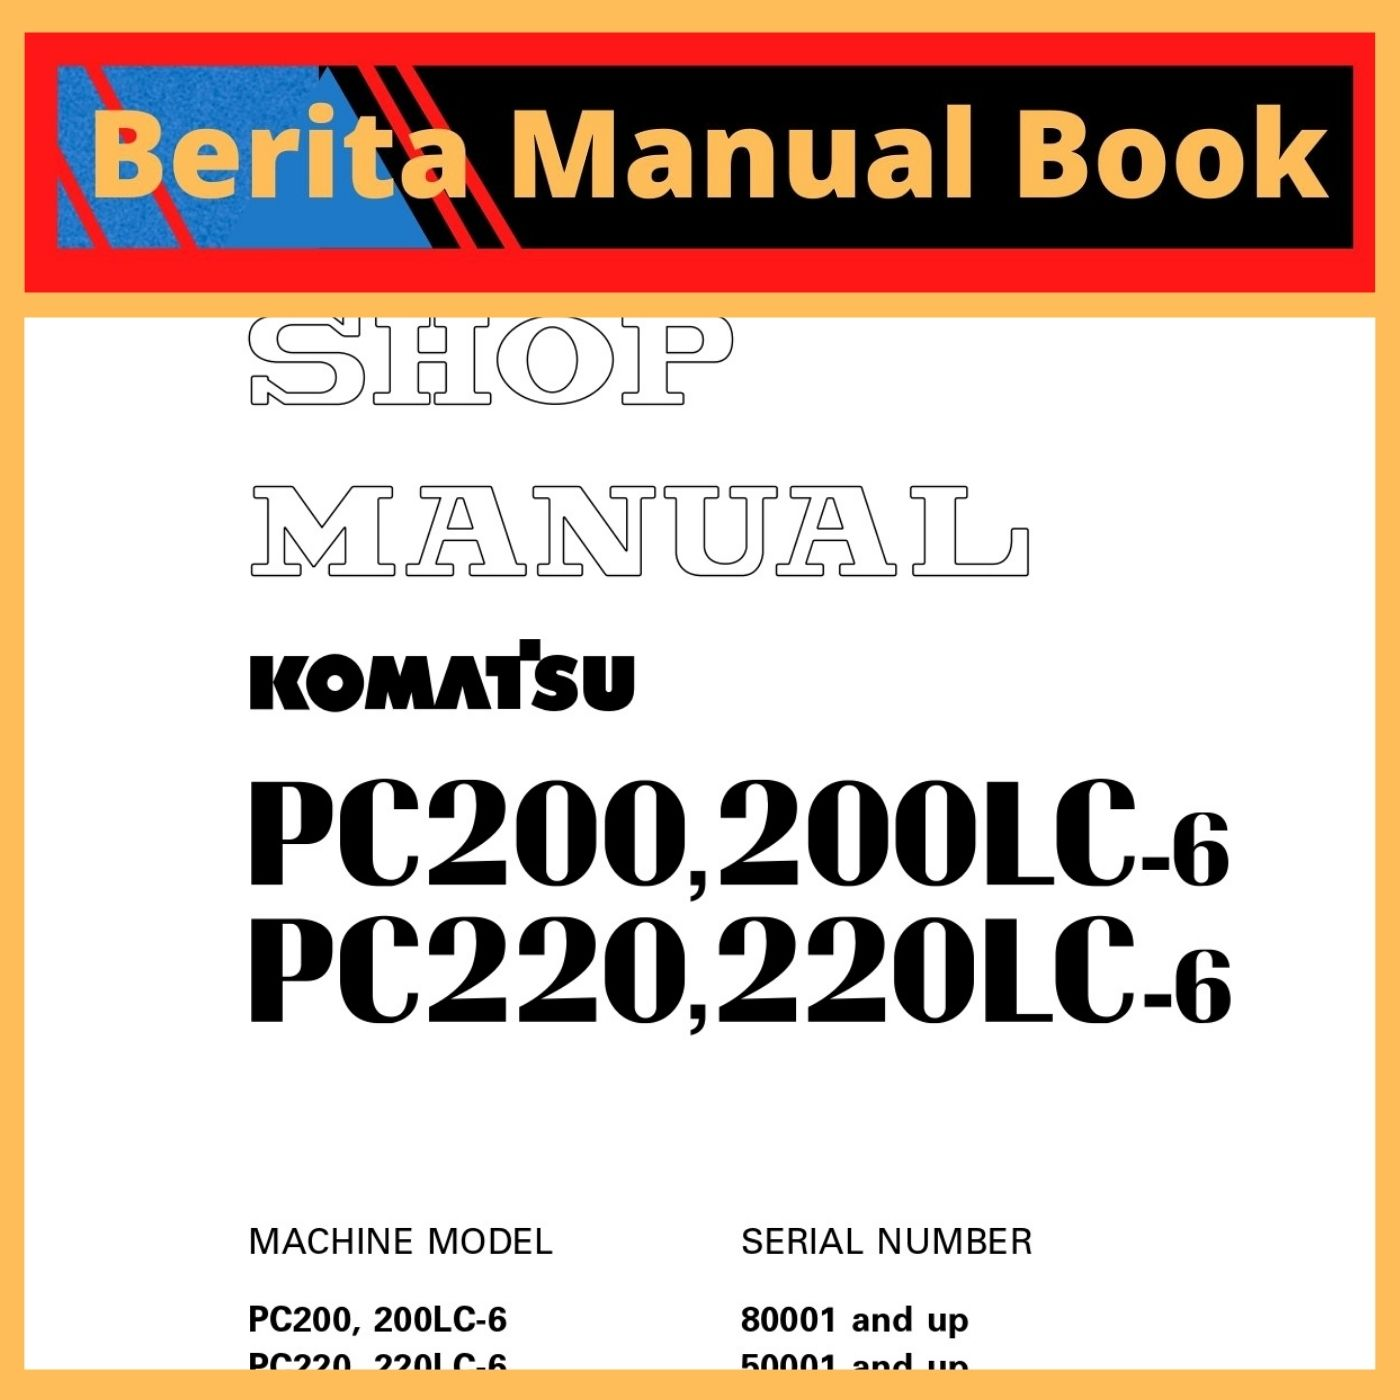 Shop Manual pc200-6 pc200lc-6 pc220-6 pc220lc-6 custom